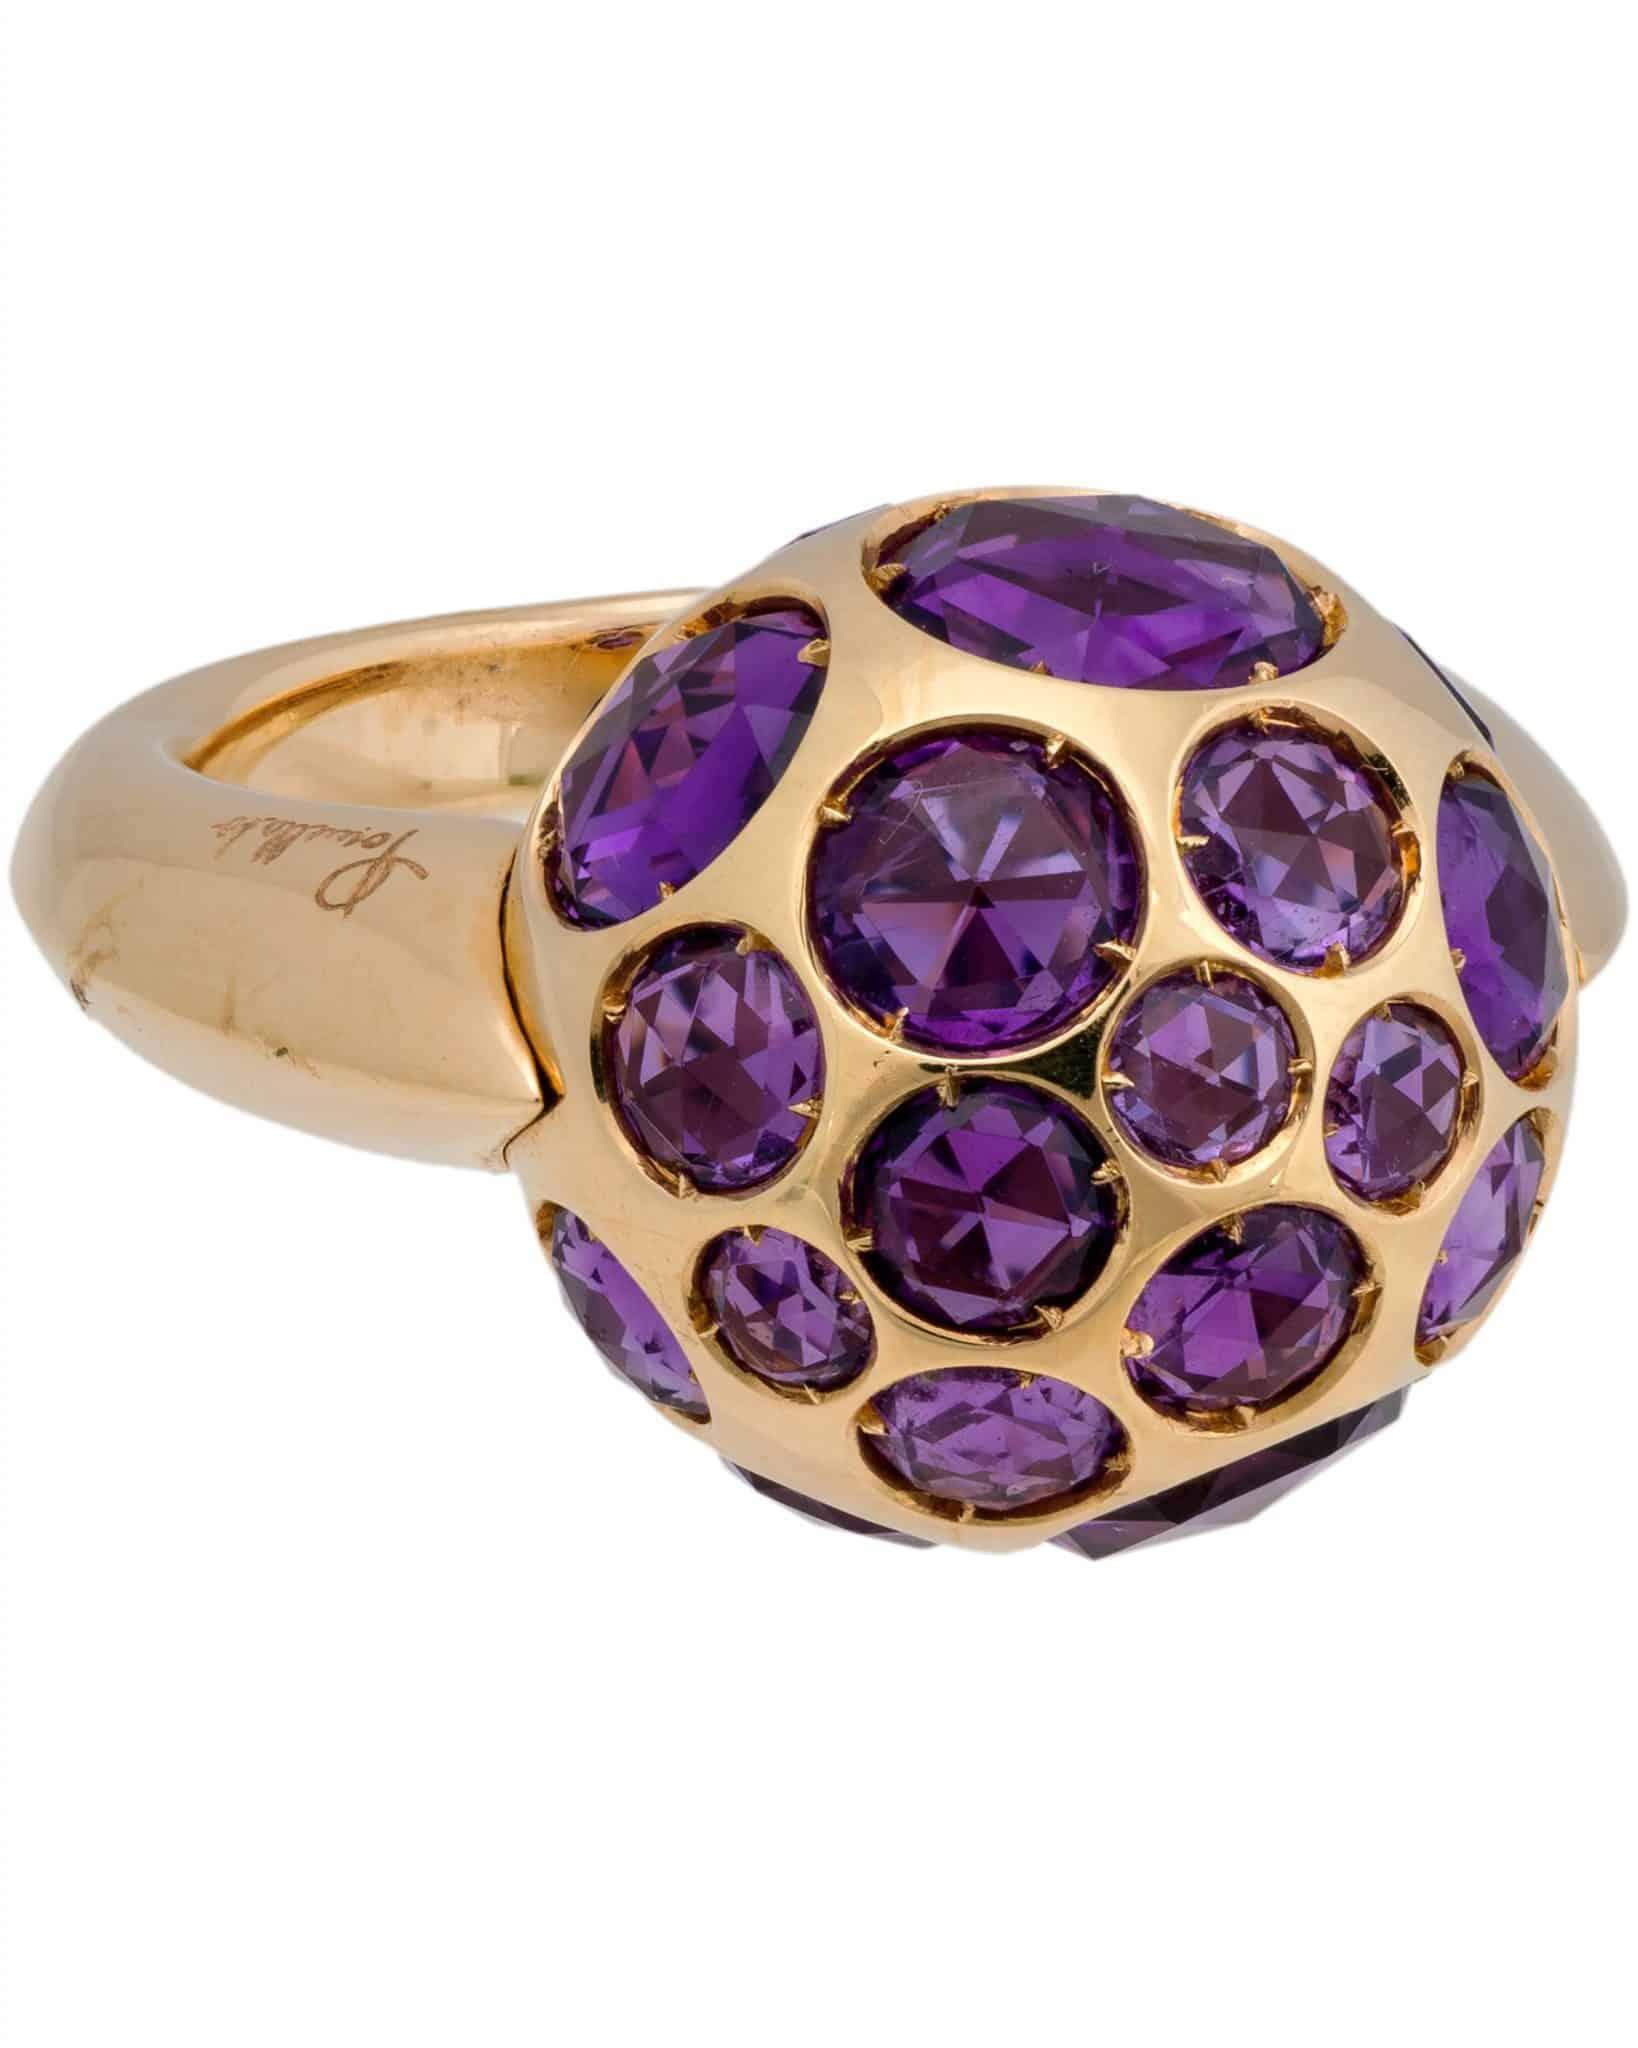 POMELLATO Harem 18K Rose Gold and Amethyst Ring - Sz 6.5